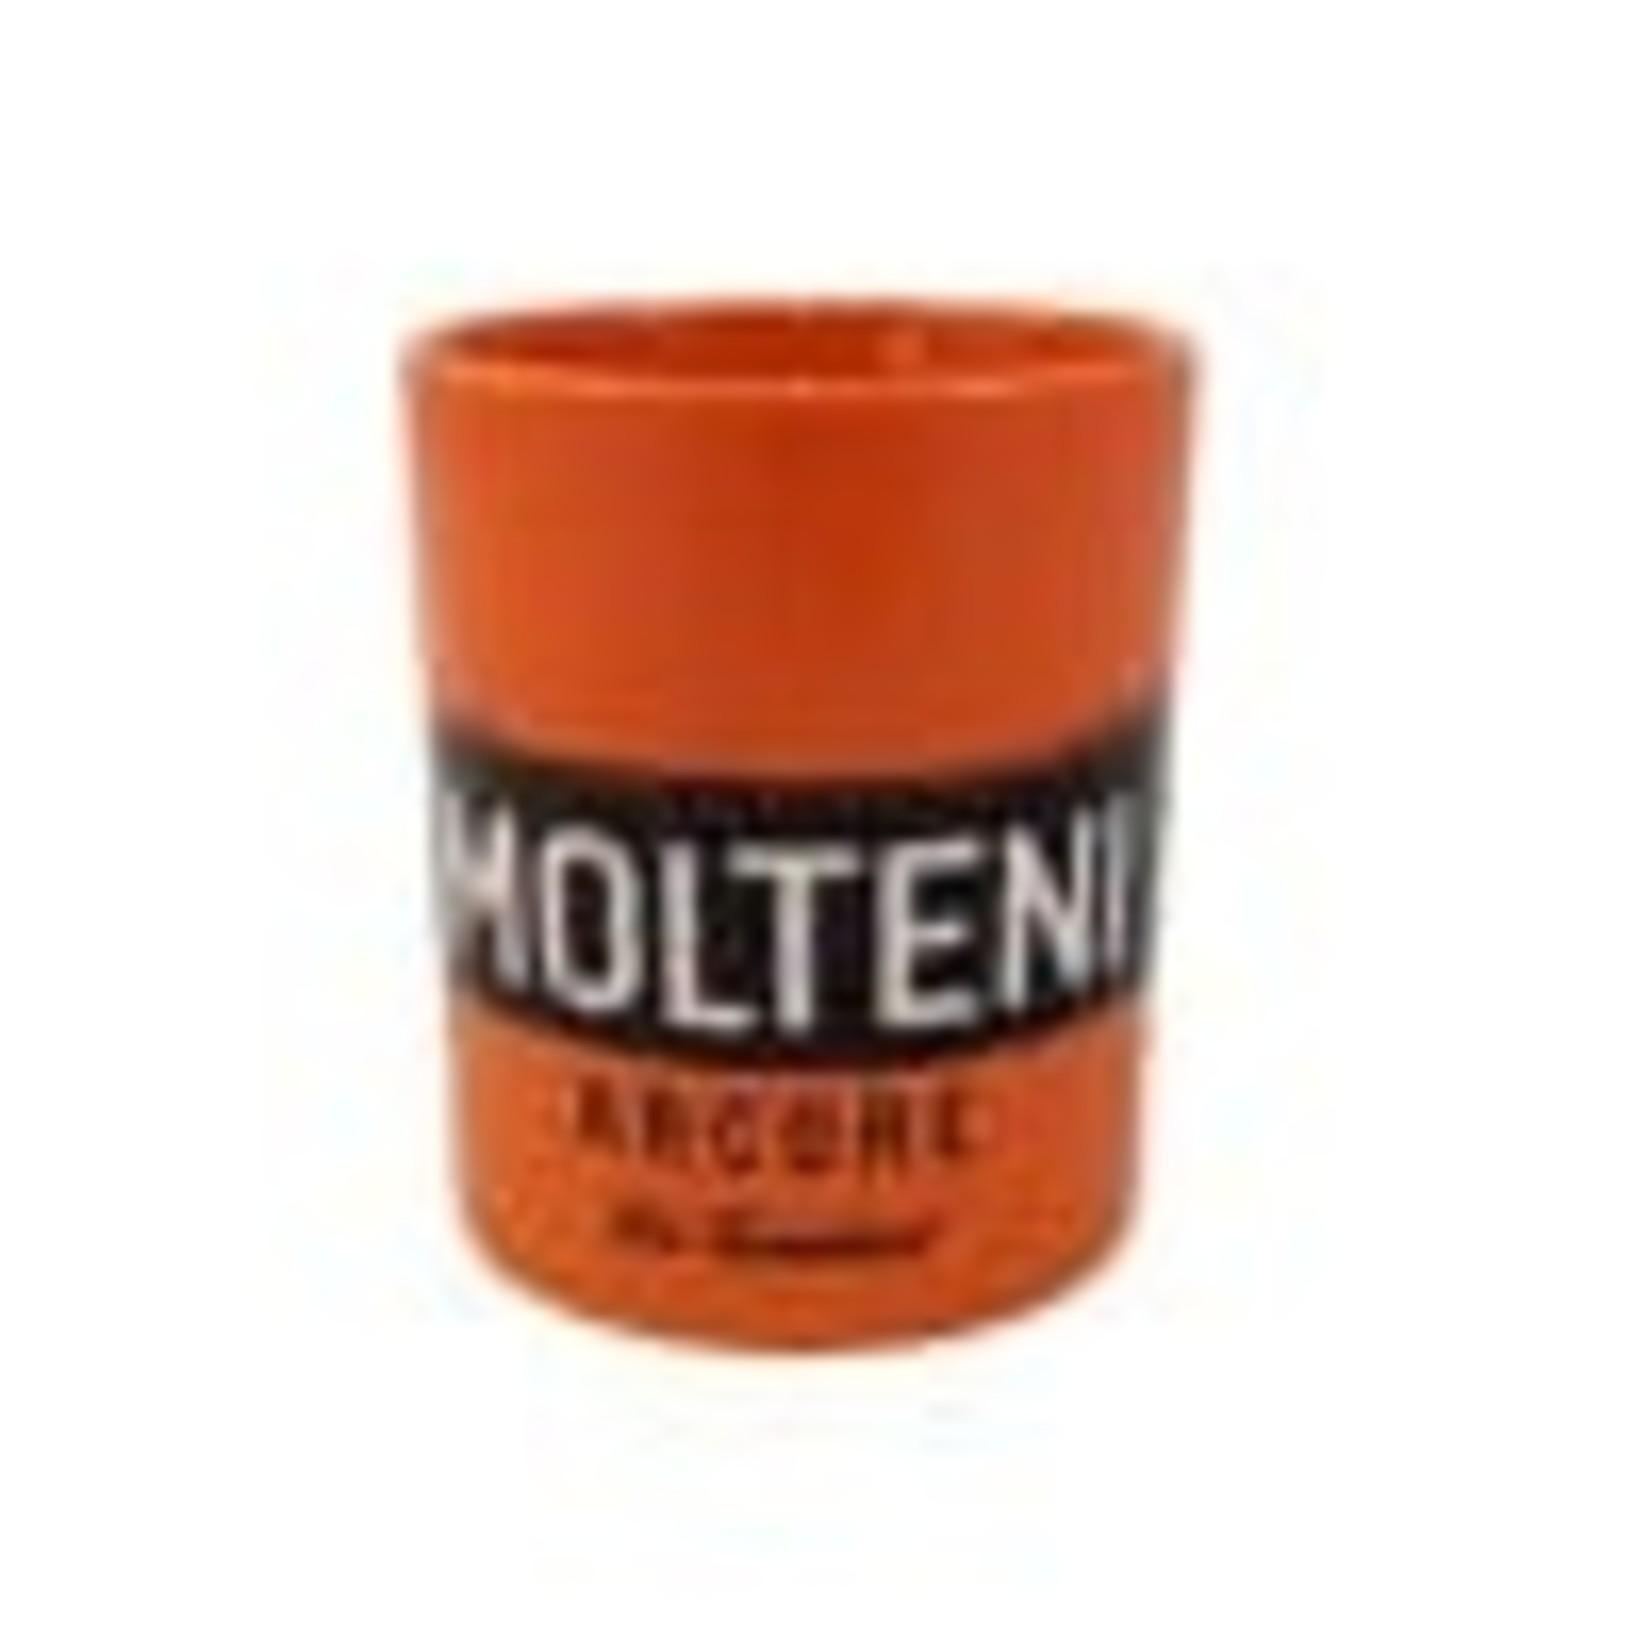 Coffee mug 'Molteni'